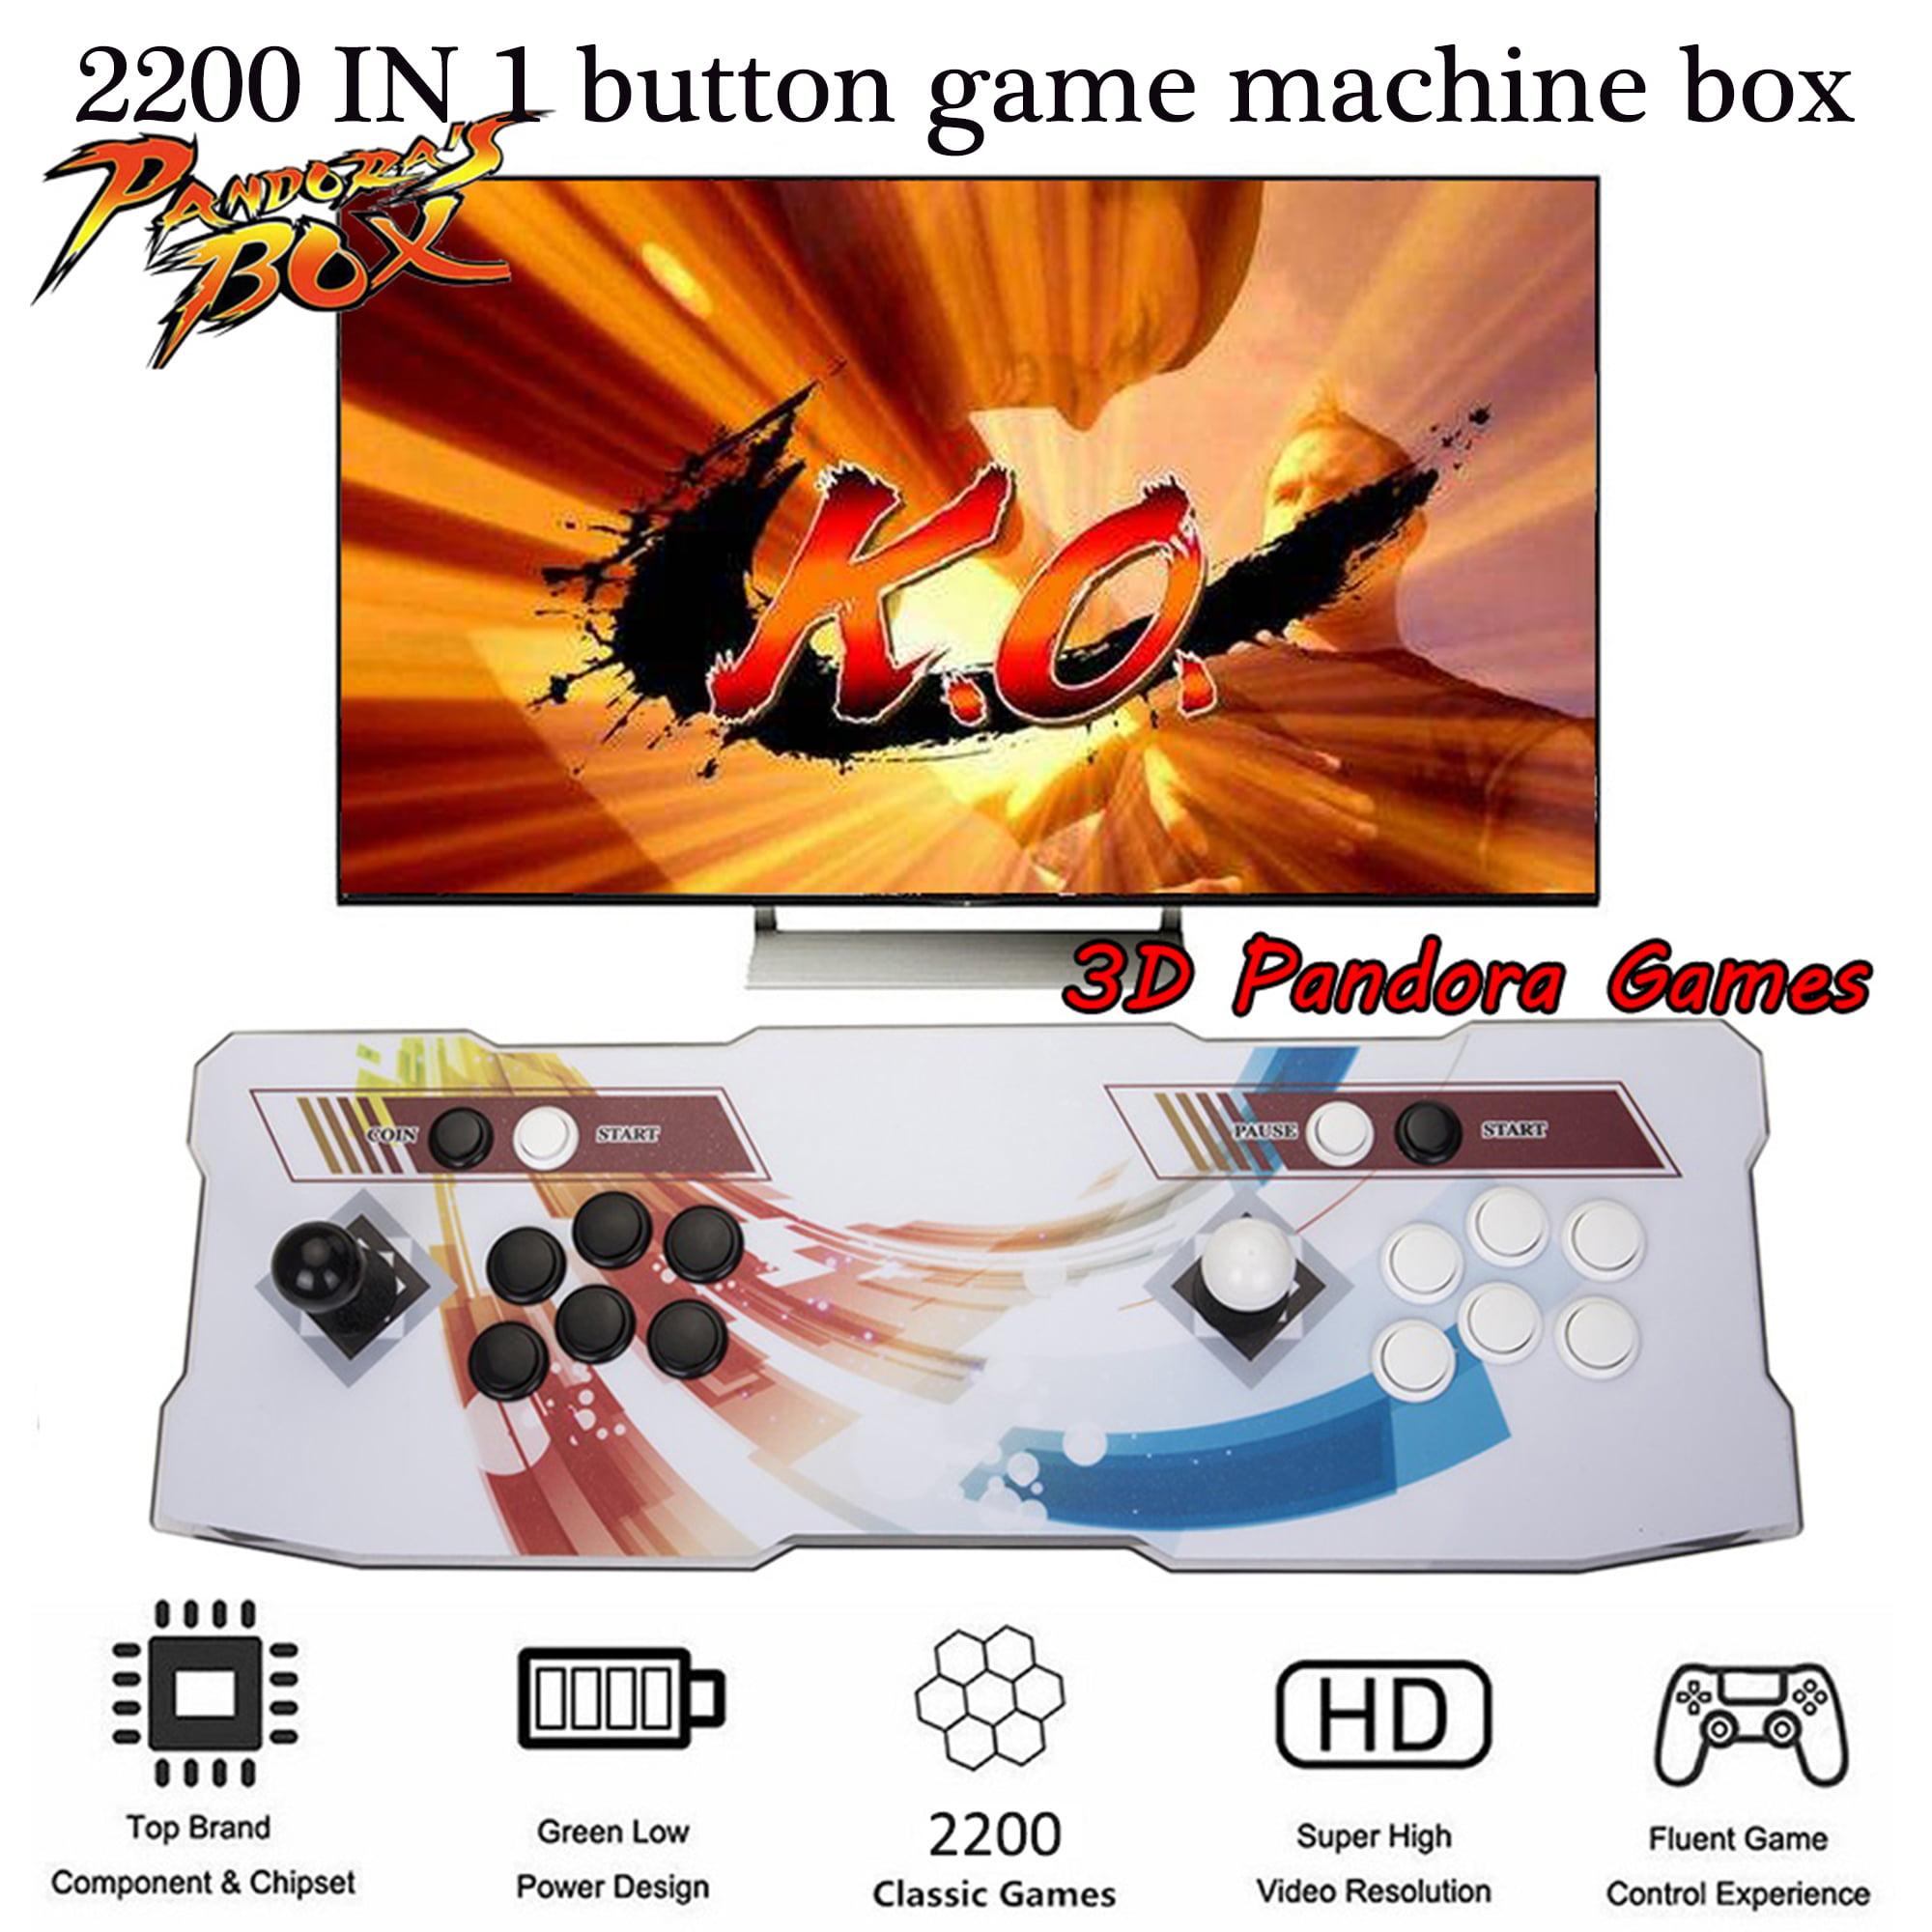 NK 3D Pandora Arcade Game Console 2200 IN 1 HD Retro Games Multiplayer Home Players Joystick Arcade Machine